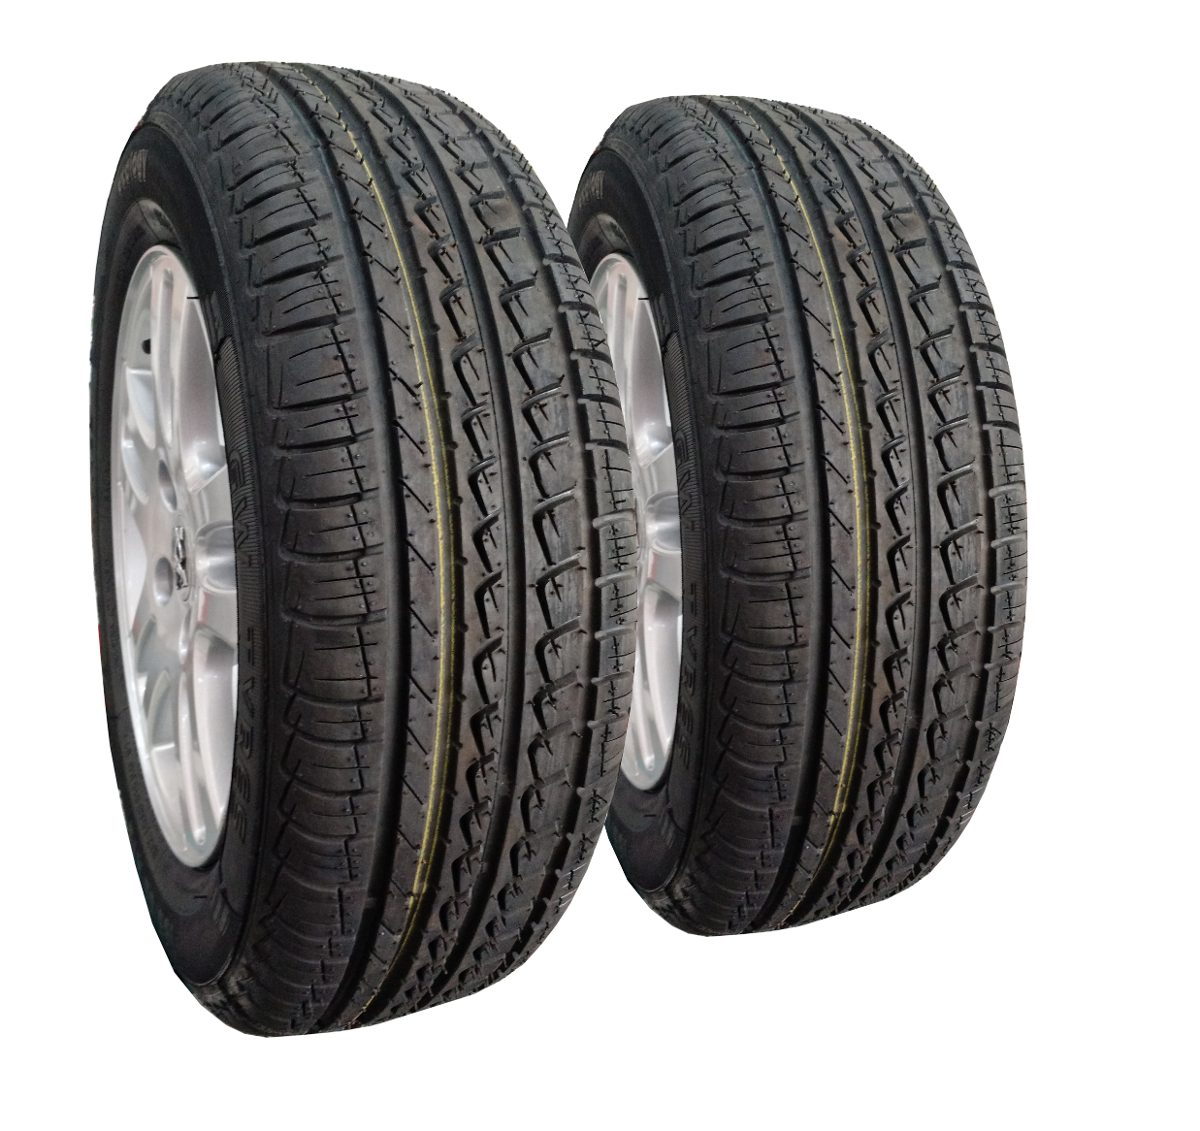 kit 2 pneu 195 65 r15 remold gw tyre pirelli 5 anos. Black Bedroom Furniture Sets. Home Design Ideas